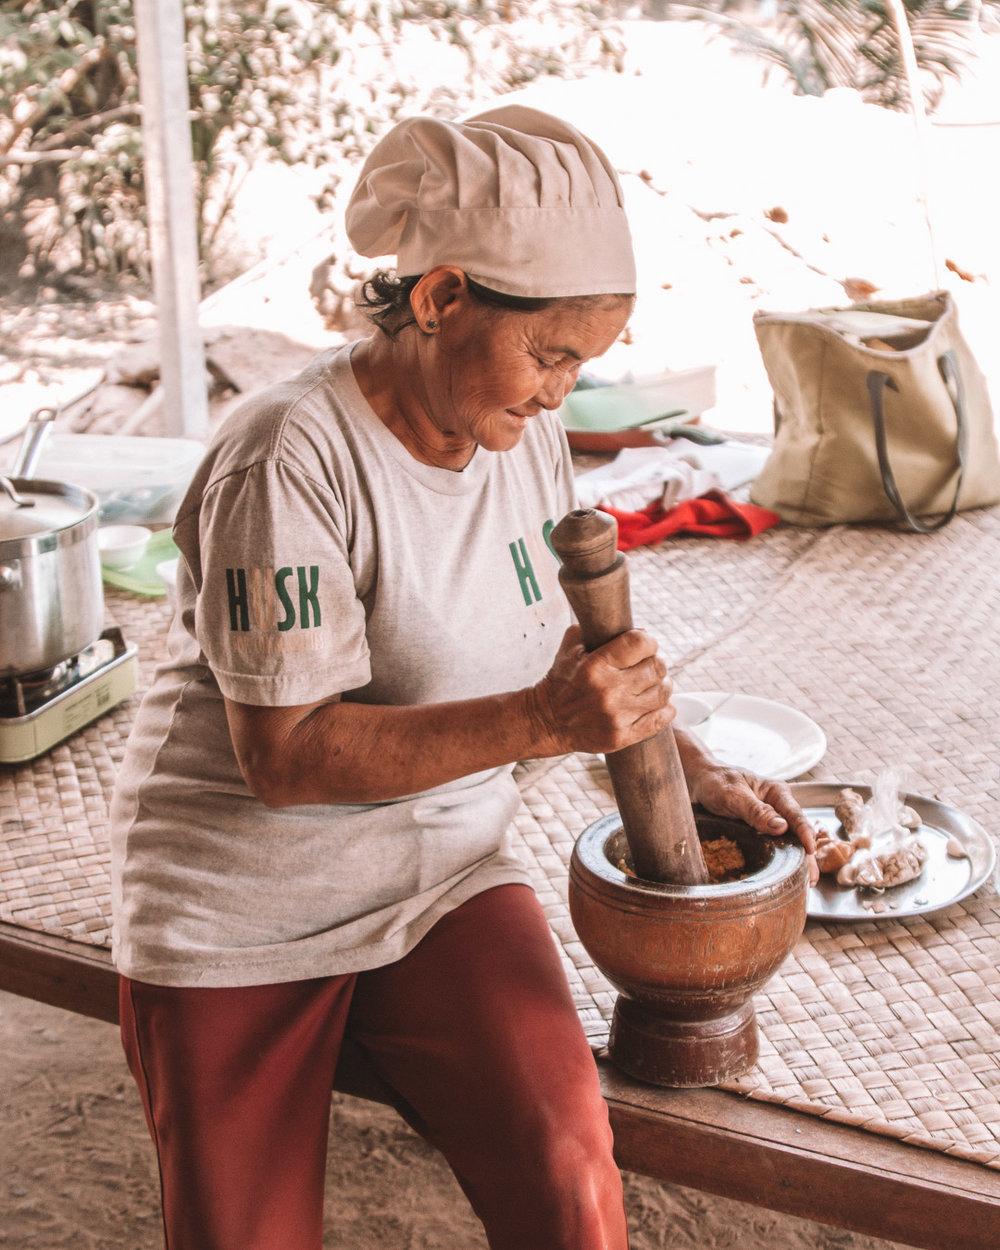 cooking food siem reap husk